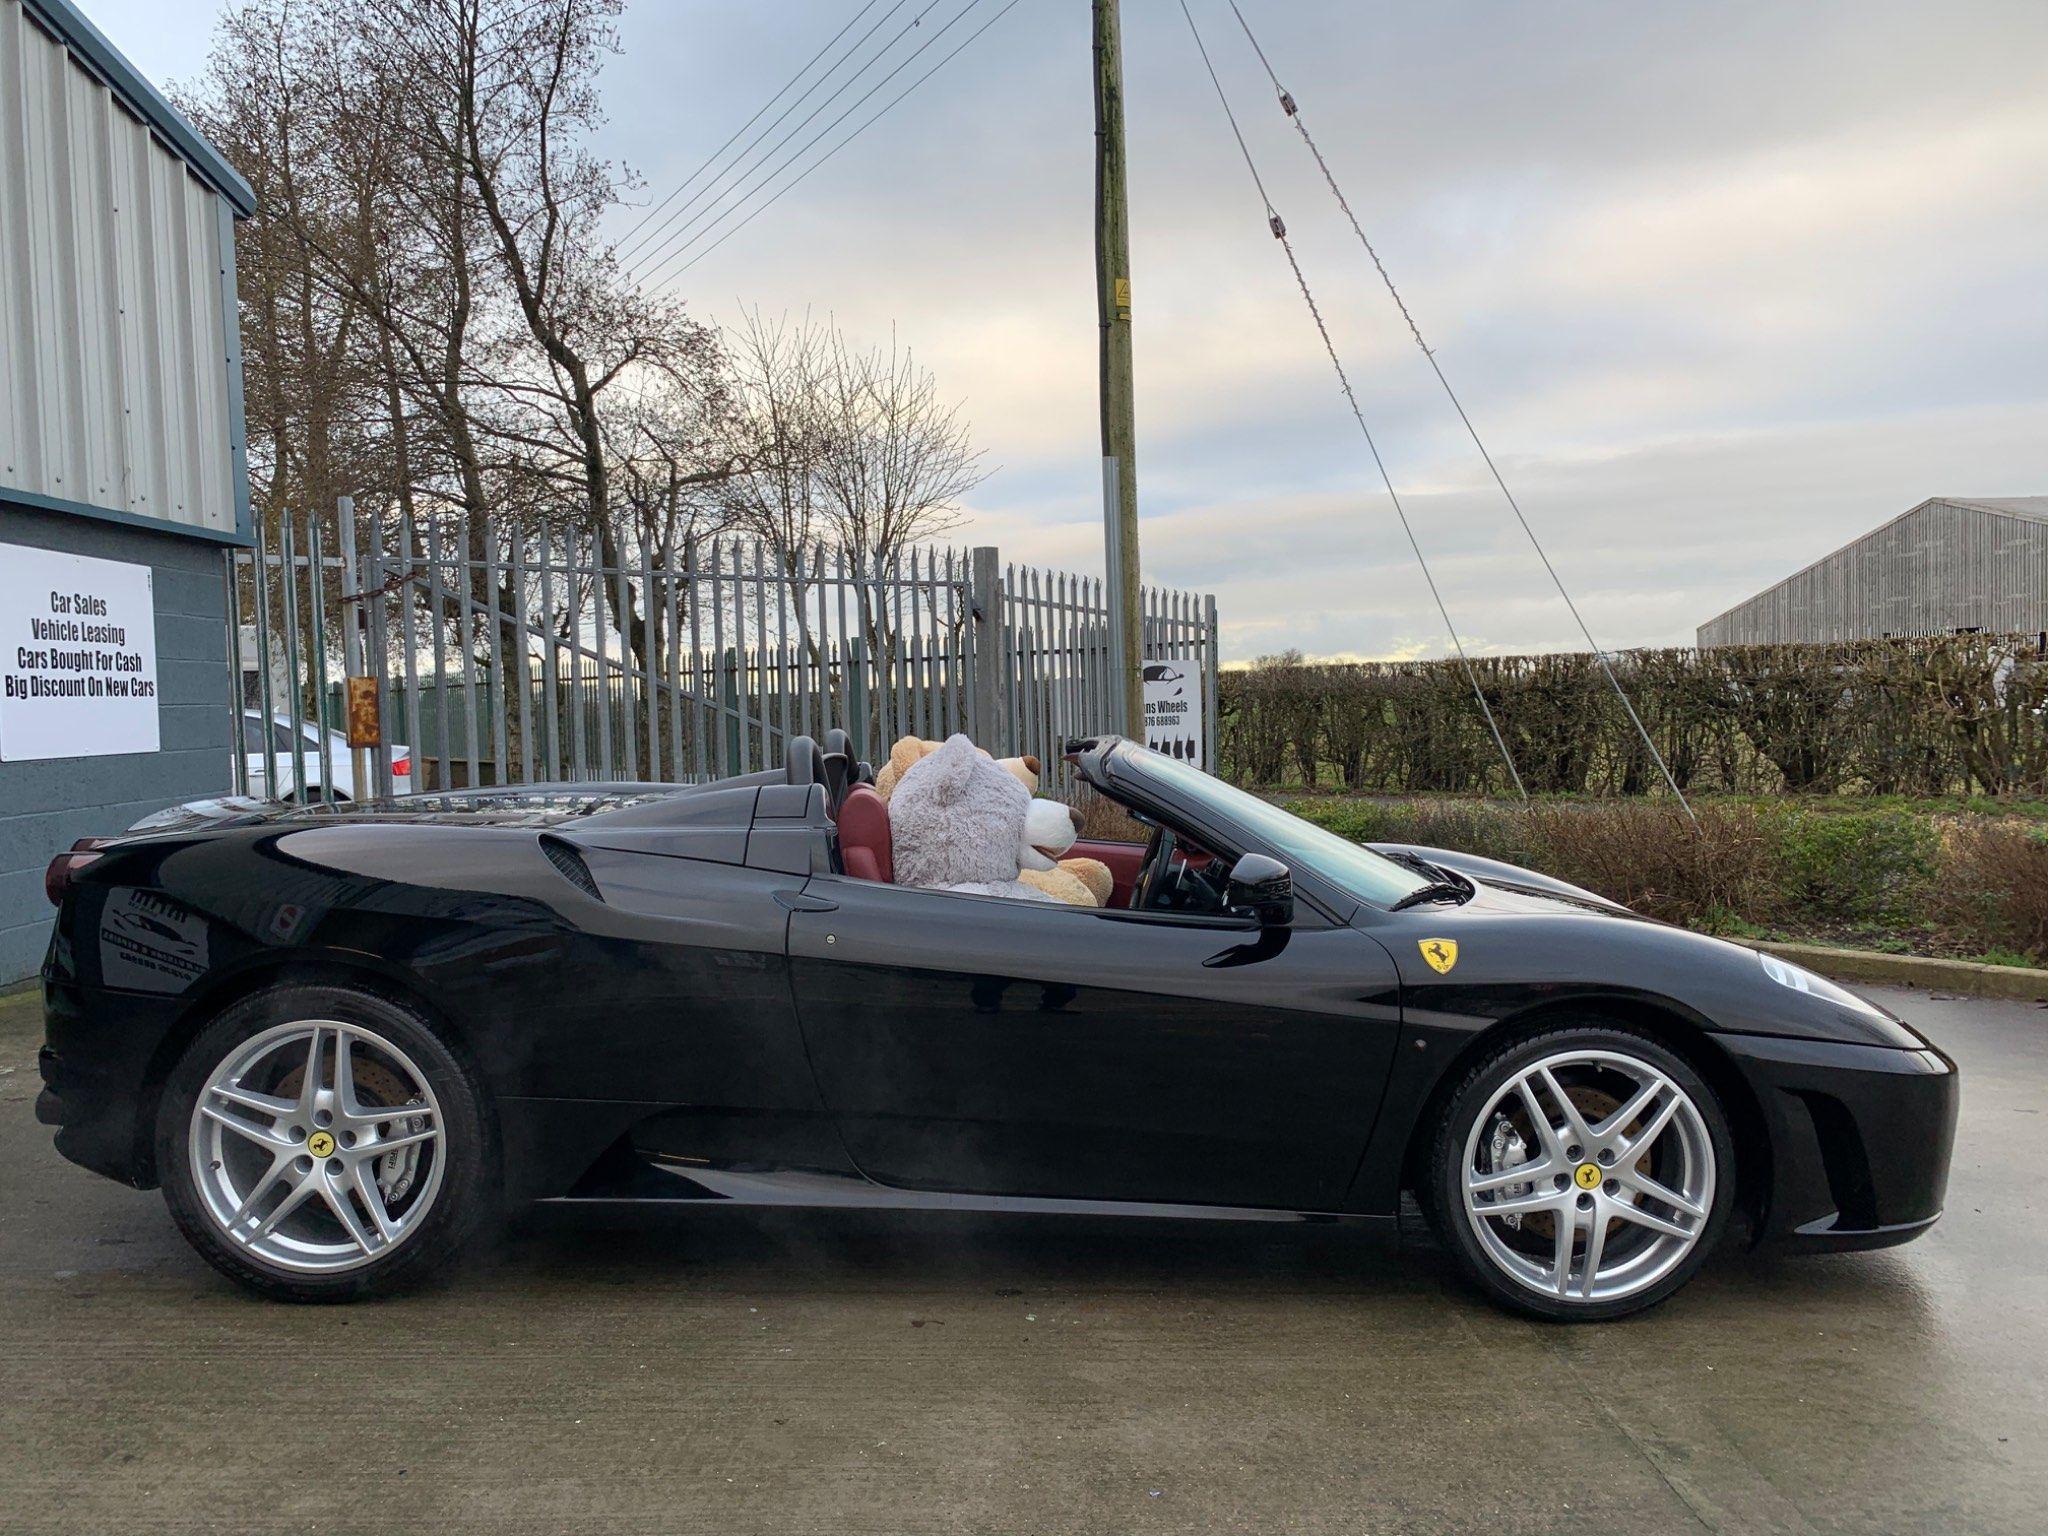 Ferrari Convertible Classic Cars For Sale Autotrader Uk